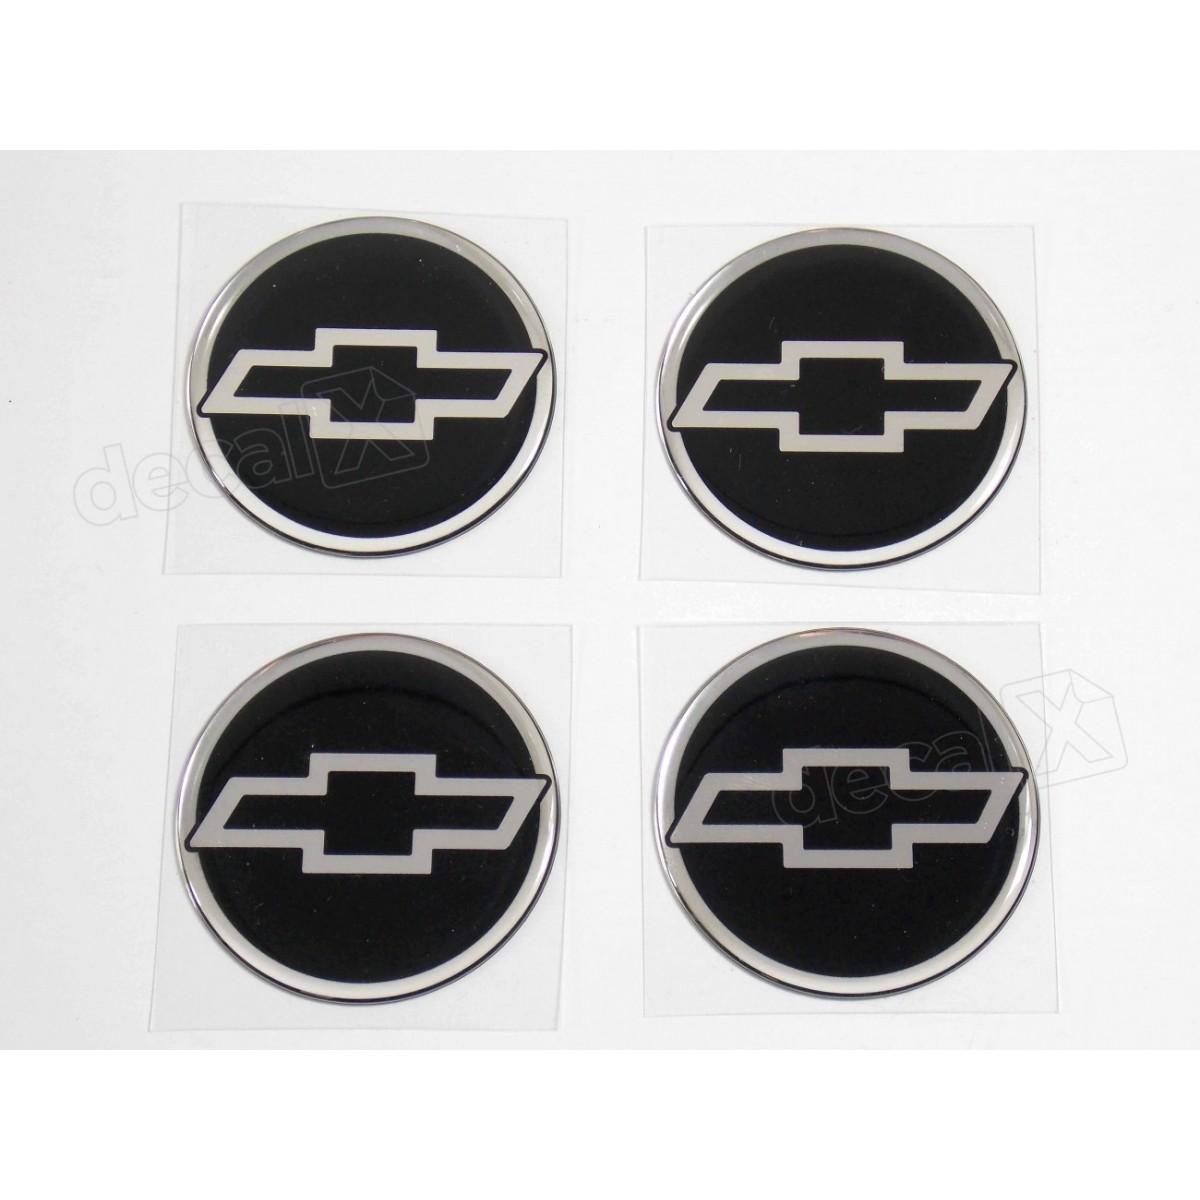 Adesivo Emblema Resinado Roda Tracker 55mm Cl19